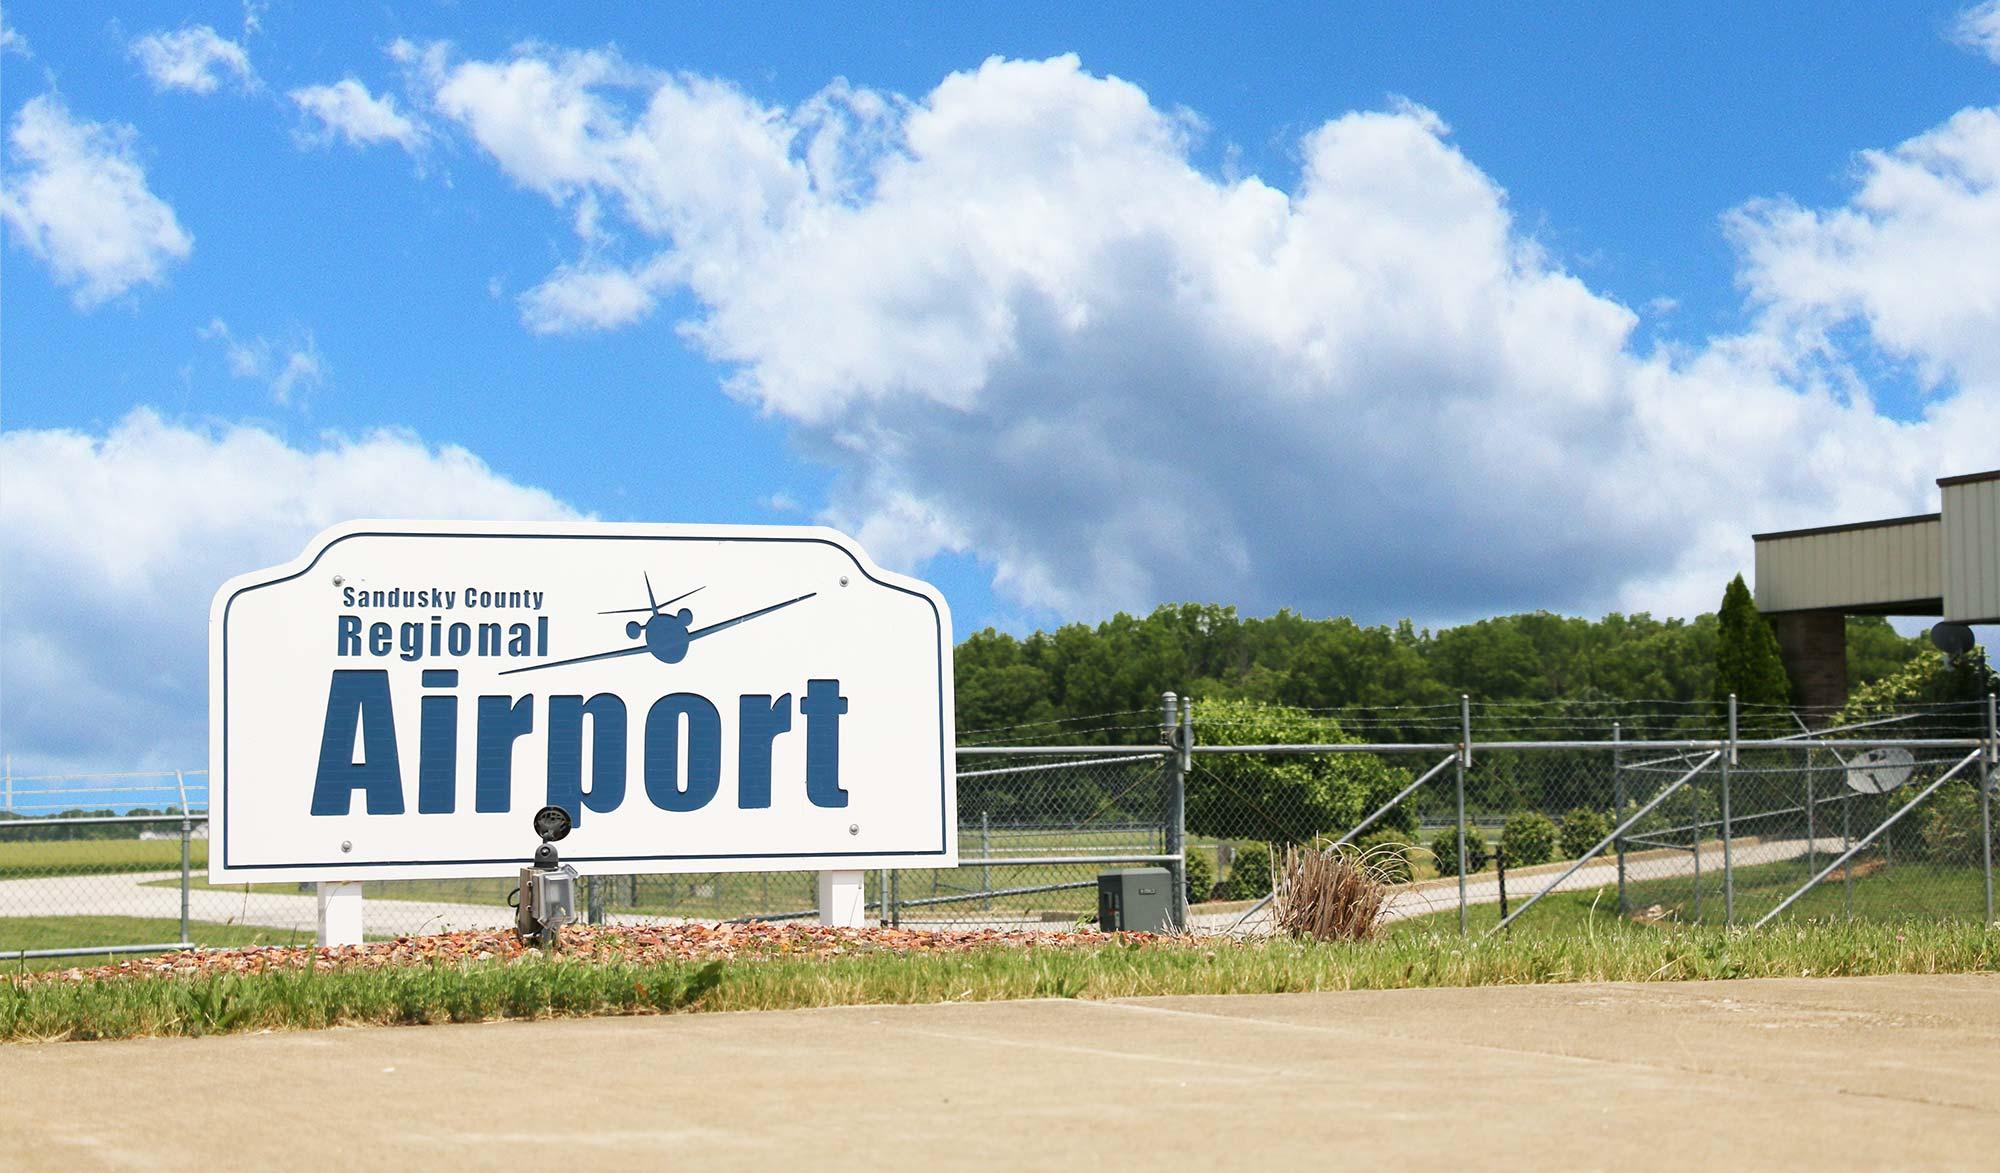 Sandusky County Regional Airport